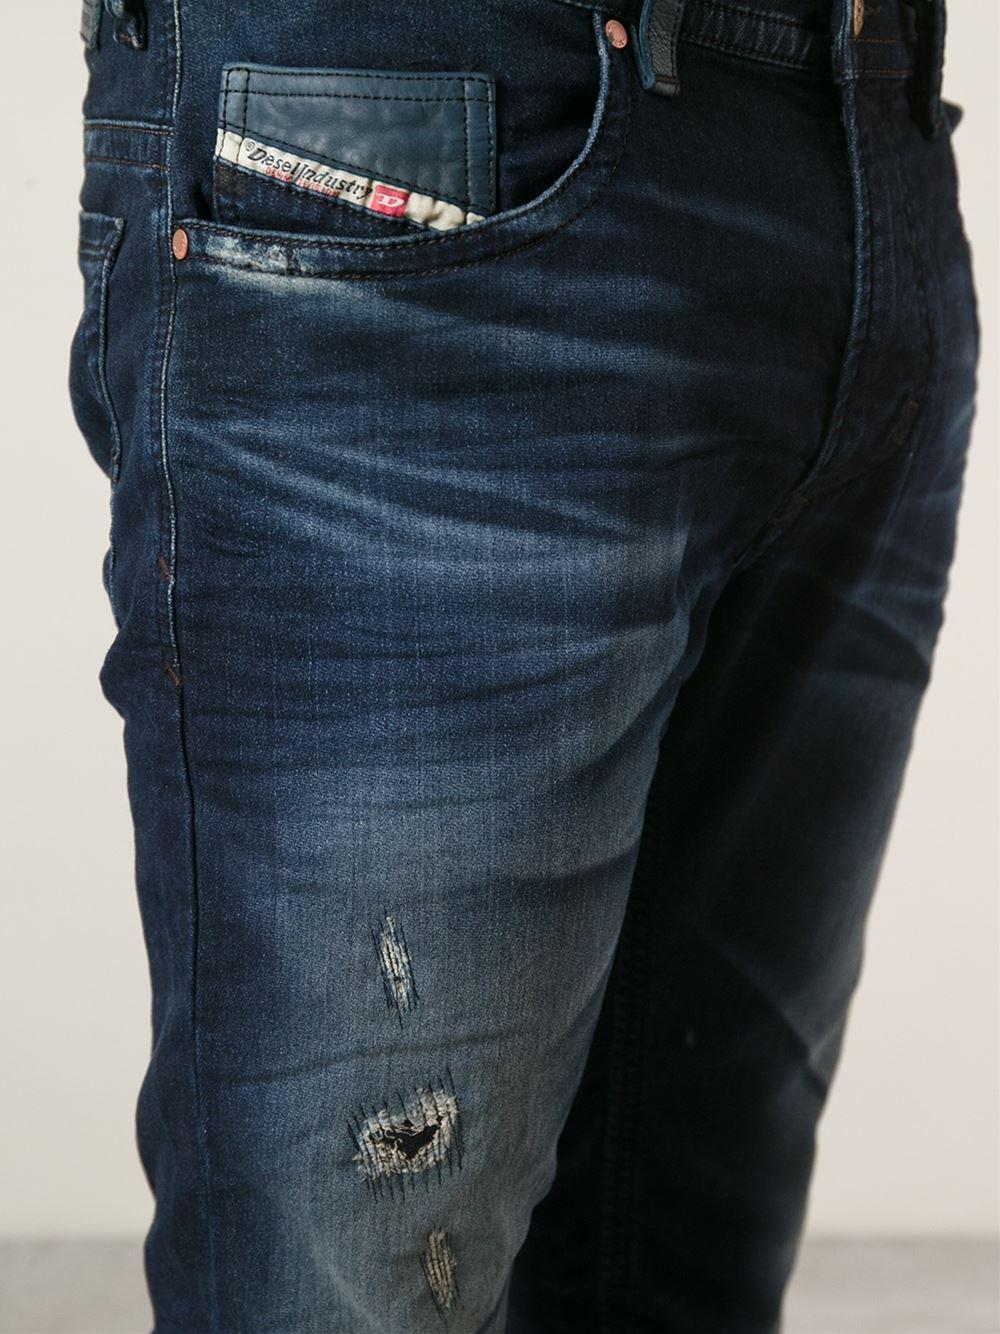 b23d7694 DIESEL 'Thavar' Slim Fit Jeans in Blue for Men - Lyst